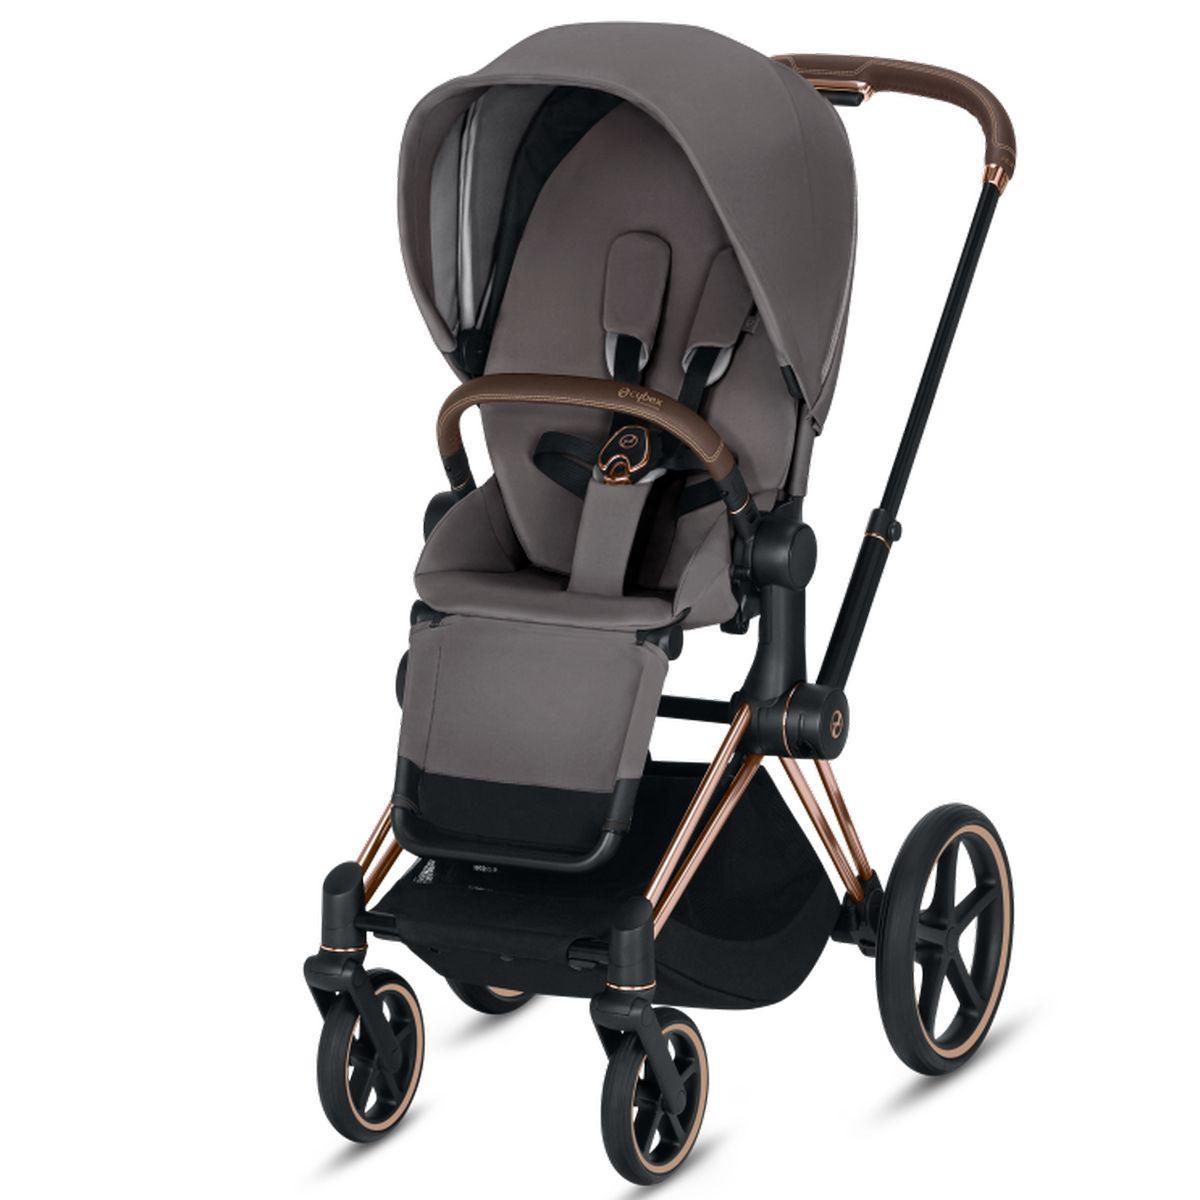 Asiento-pack silla PRIAM Cybex manhattan grey-mid grey